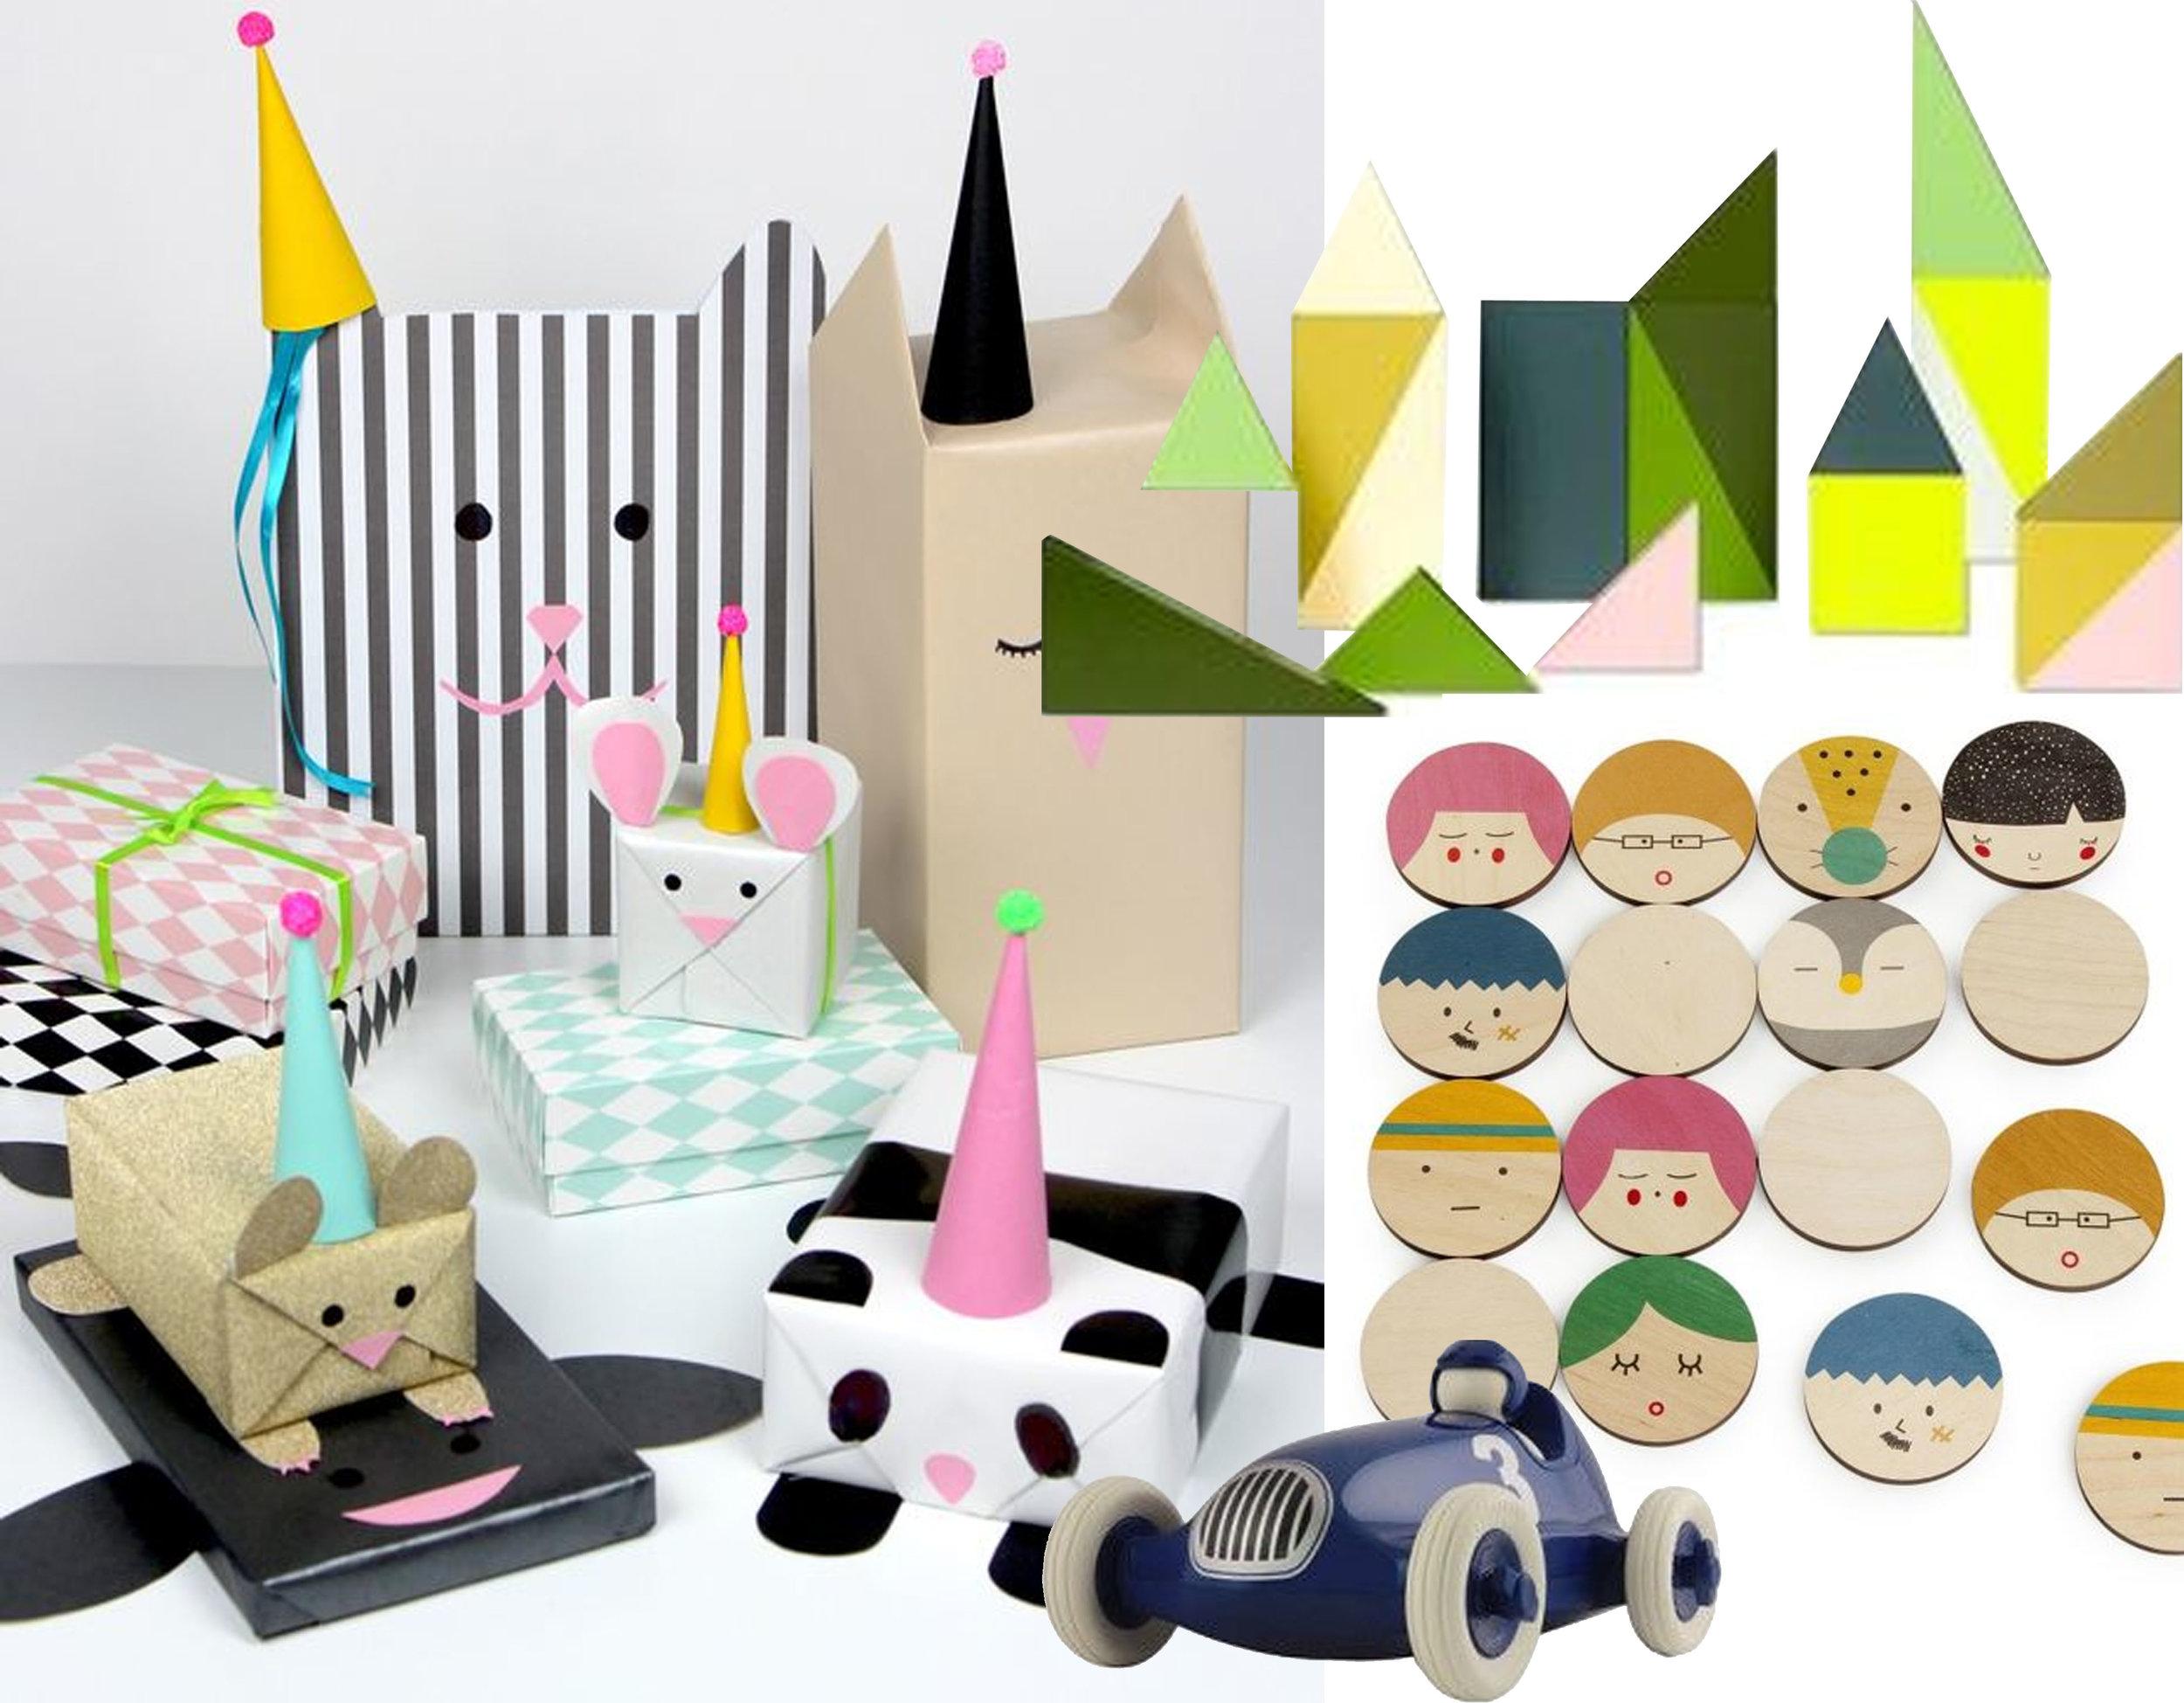 kids' gift wrapping ideas via  Blog&Ide - Memo Me memory set  Arthur  - Wooden Wonderland  Hay Mini Market  - Bruno Racing Toy Car  Plays Forever